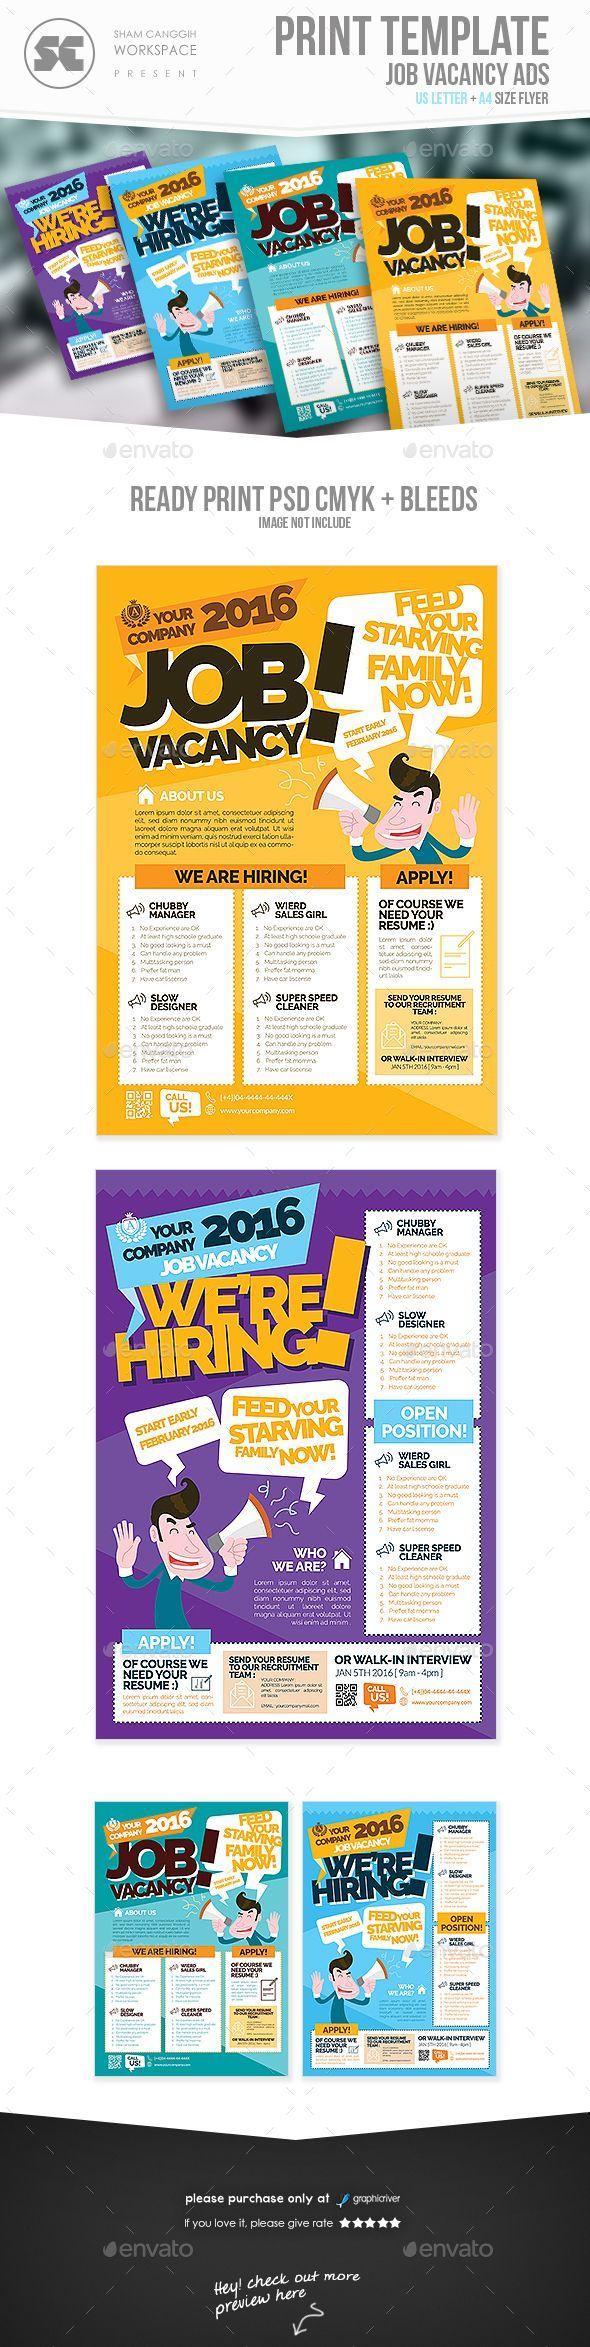 Job Fence - Job Search Engine | Recruitment poster design ...